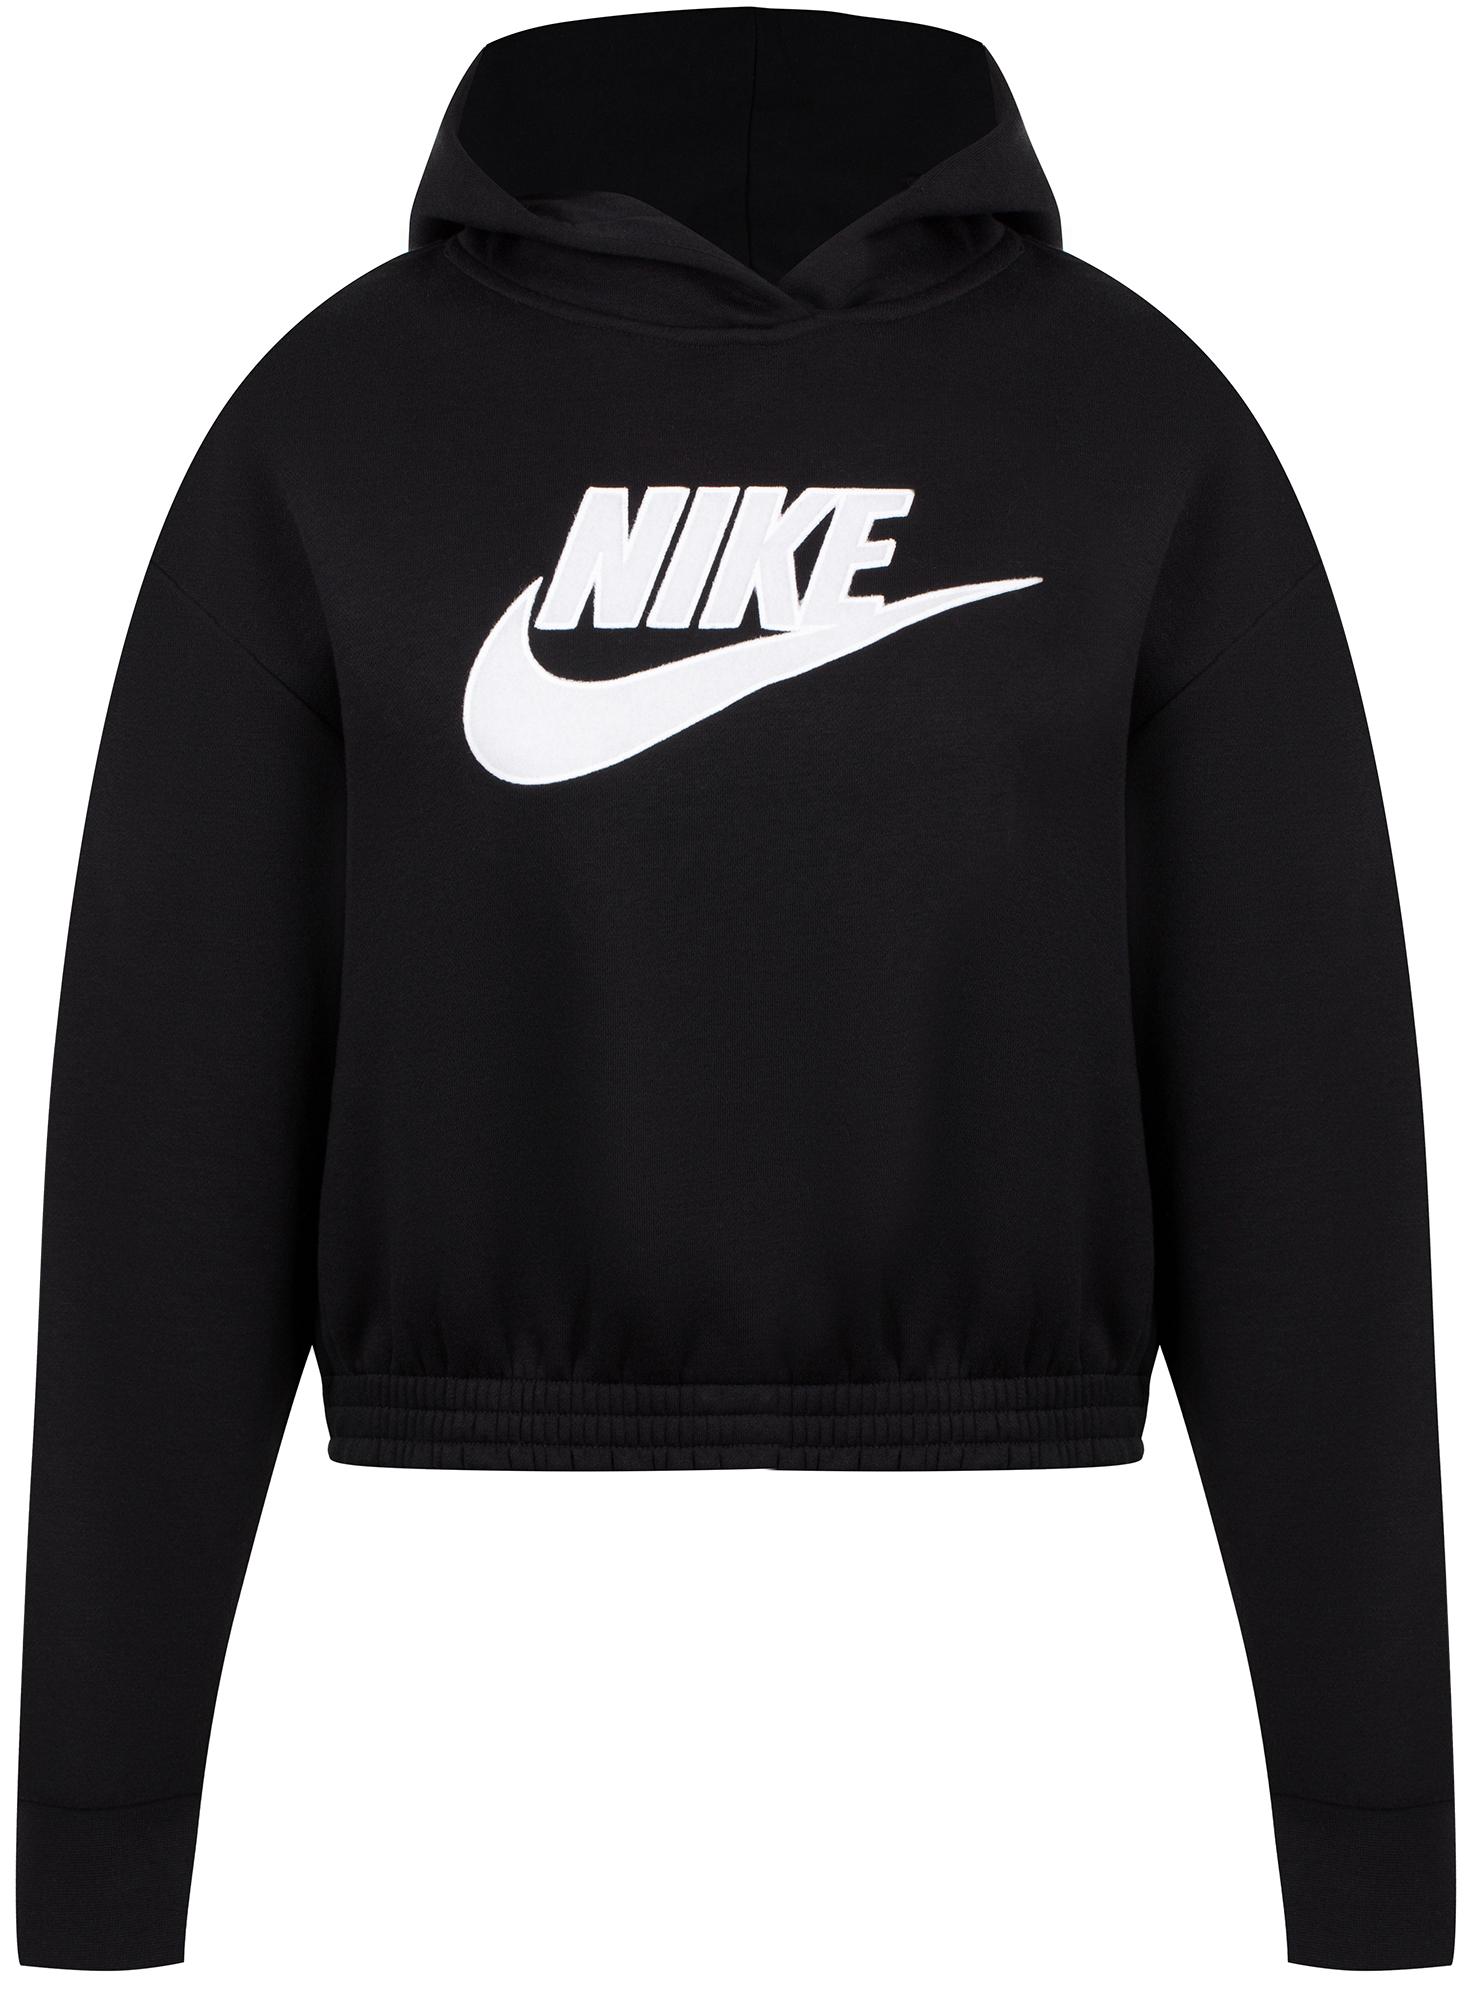 цена Nike Худи женская Nike Sportswear, размер 48-50 онлайн в 2017 году